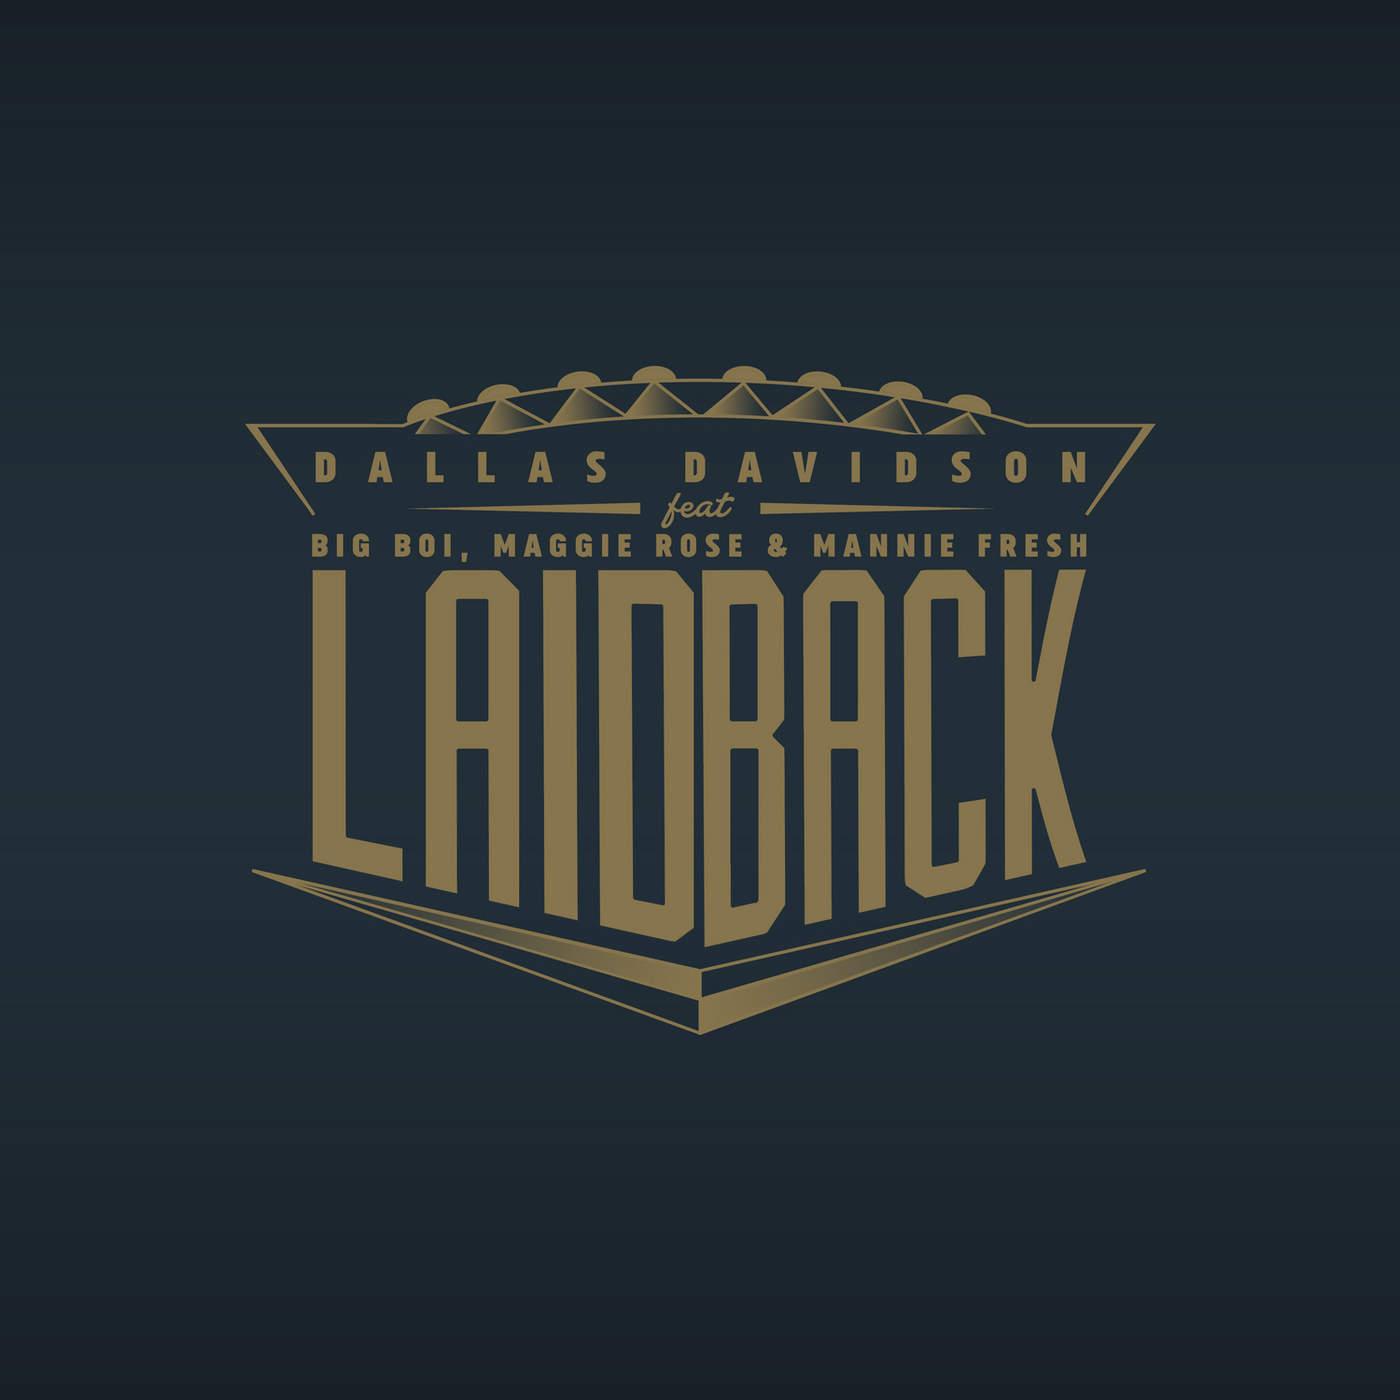 Dallas Davidson - Laid Back (feat. Big Boi, Maggie Rose & Mannie Fresh) - Single Cover